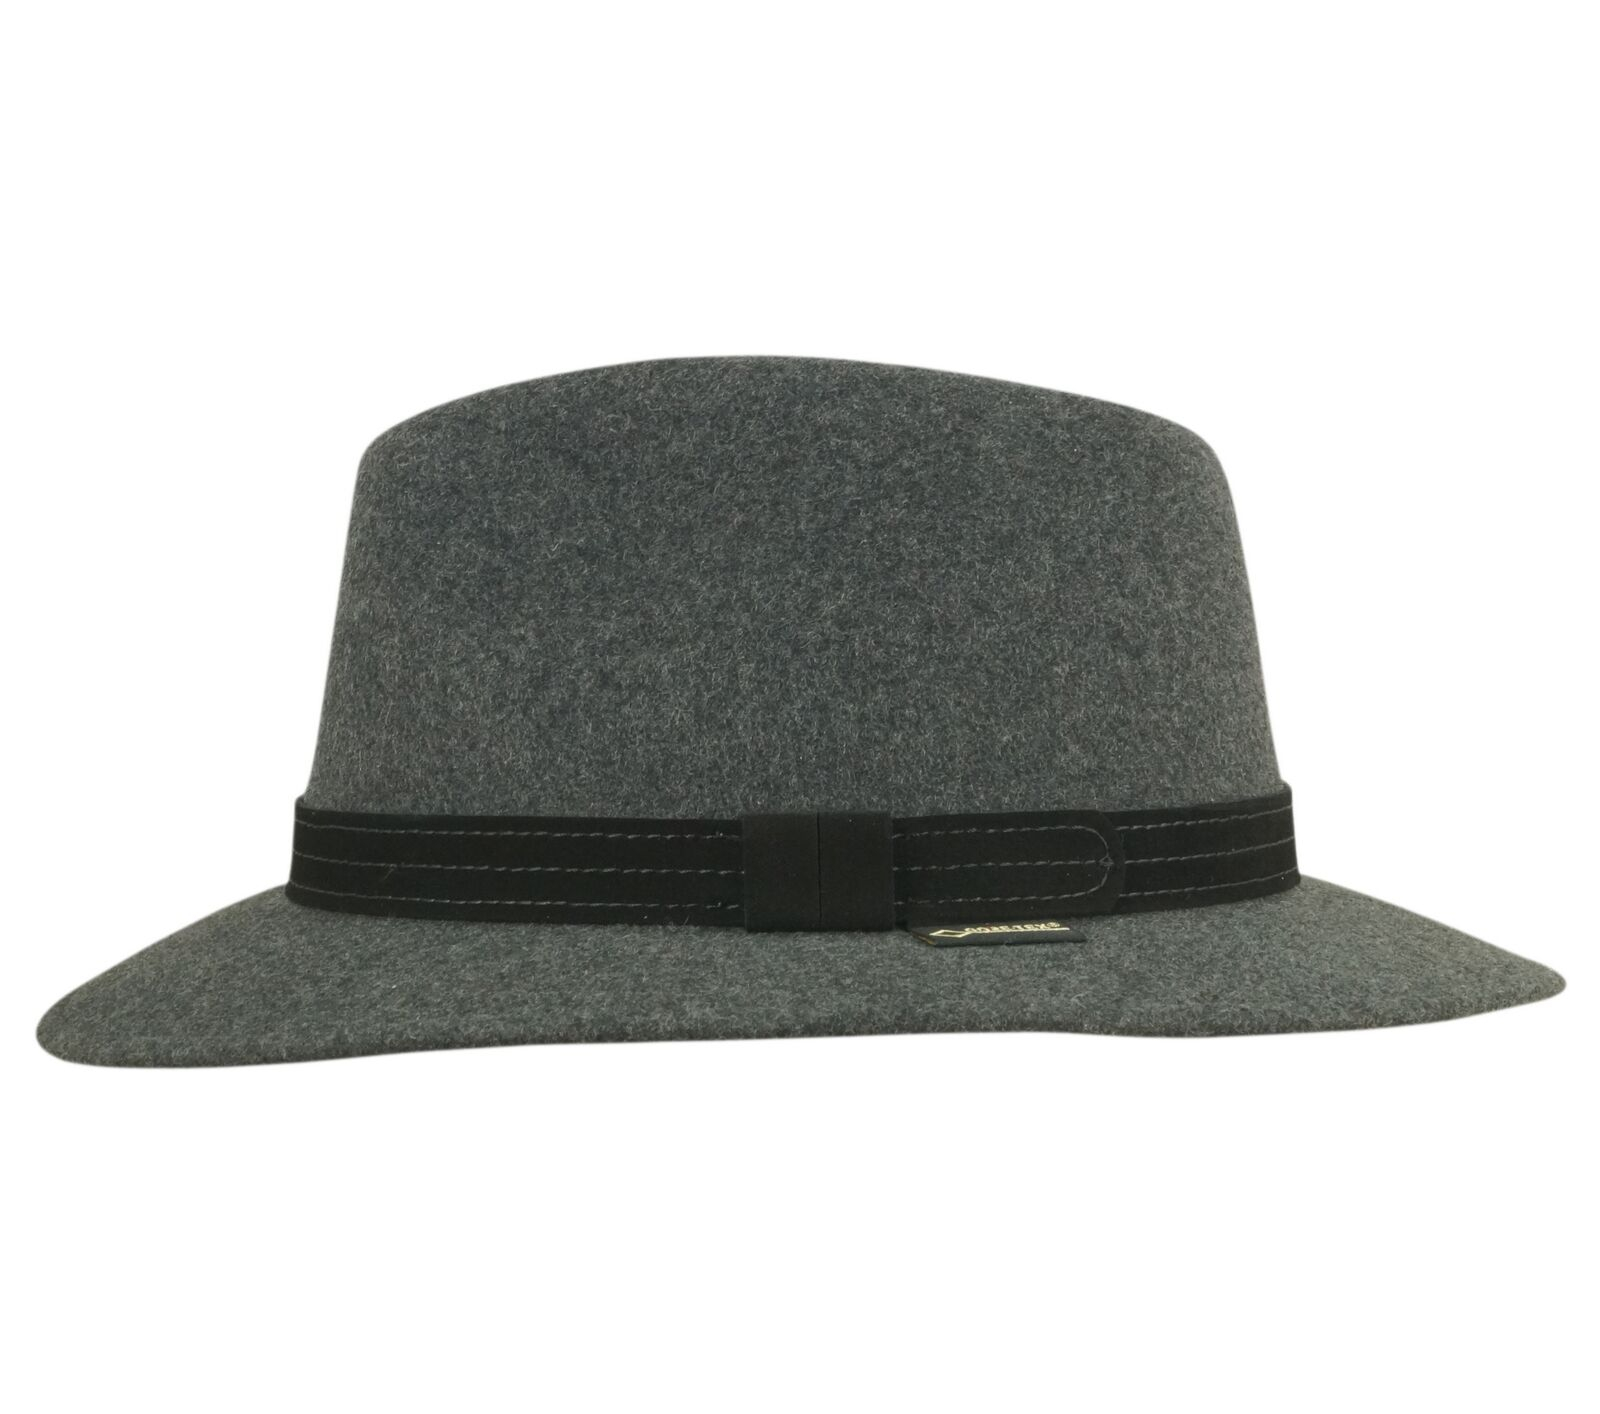 Classic Gore-Tex Mens Fedora Hat Water Repellent knautschbar - 100% Wool Felt